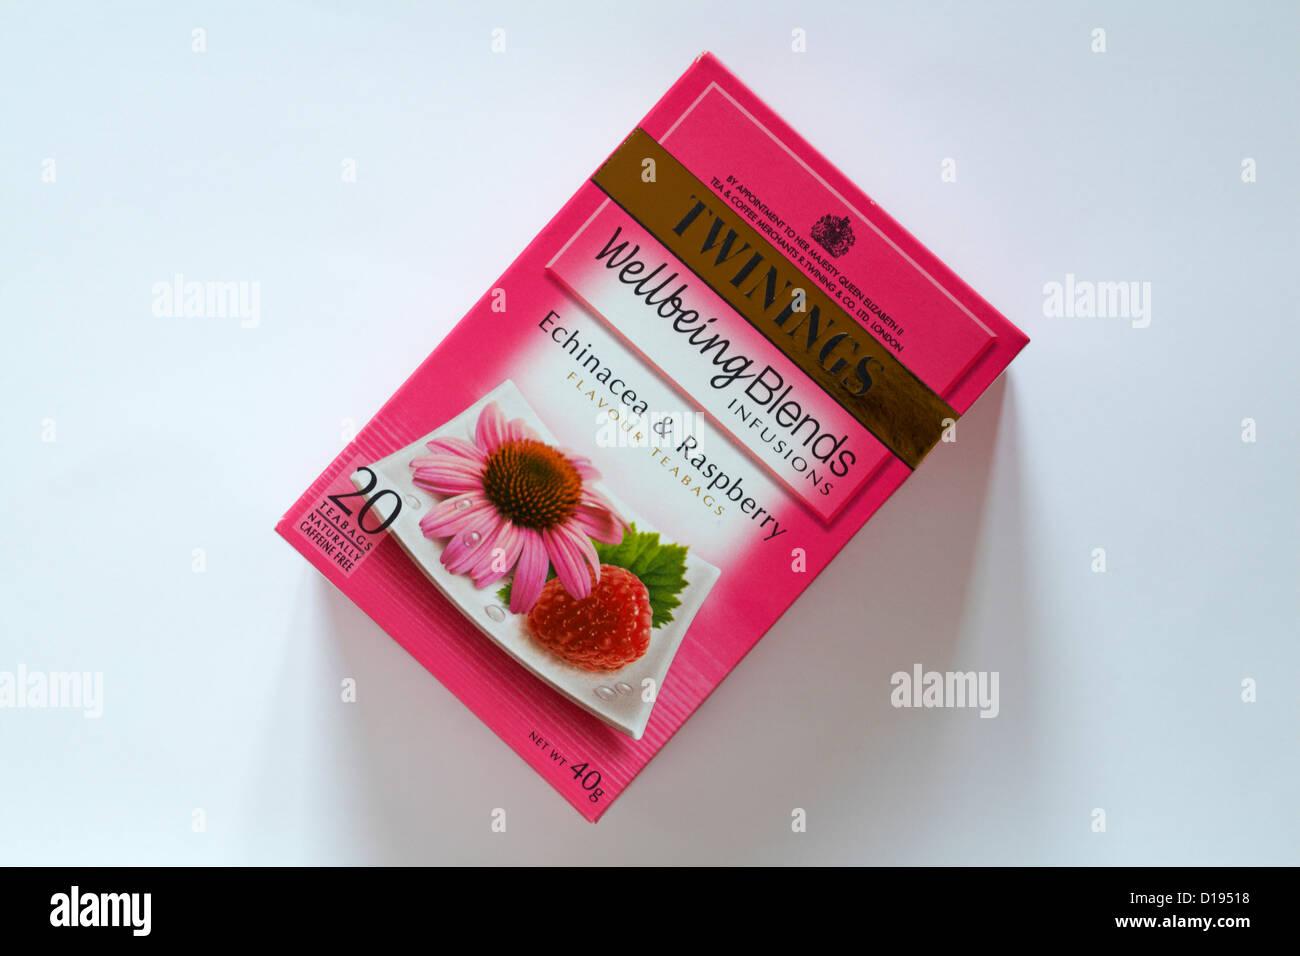 Bolsas de té Twinings teabags - Bienestar combina la equinácea infusiones    sabor frambuesa teabags Imagen 068011ed42cf